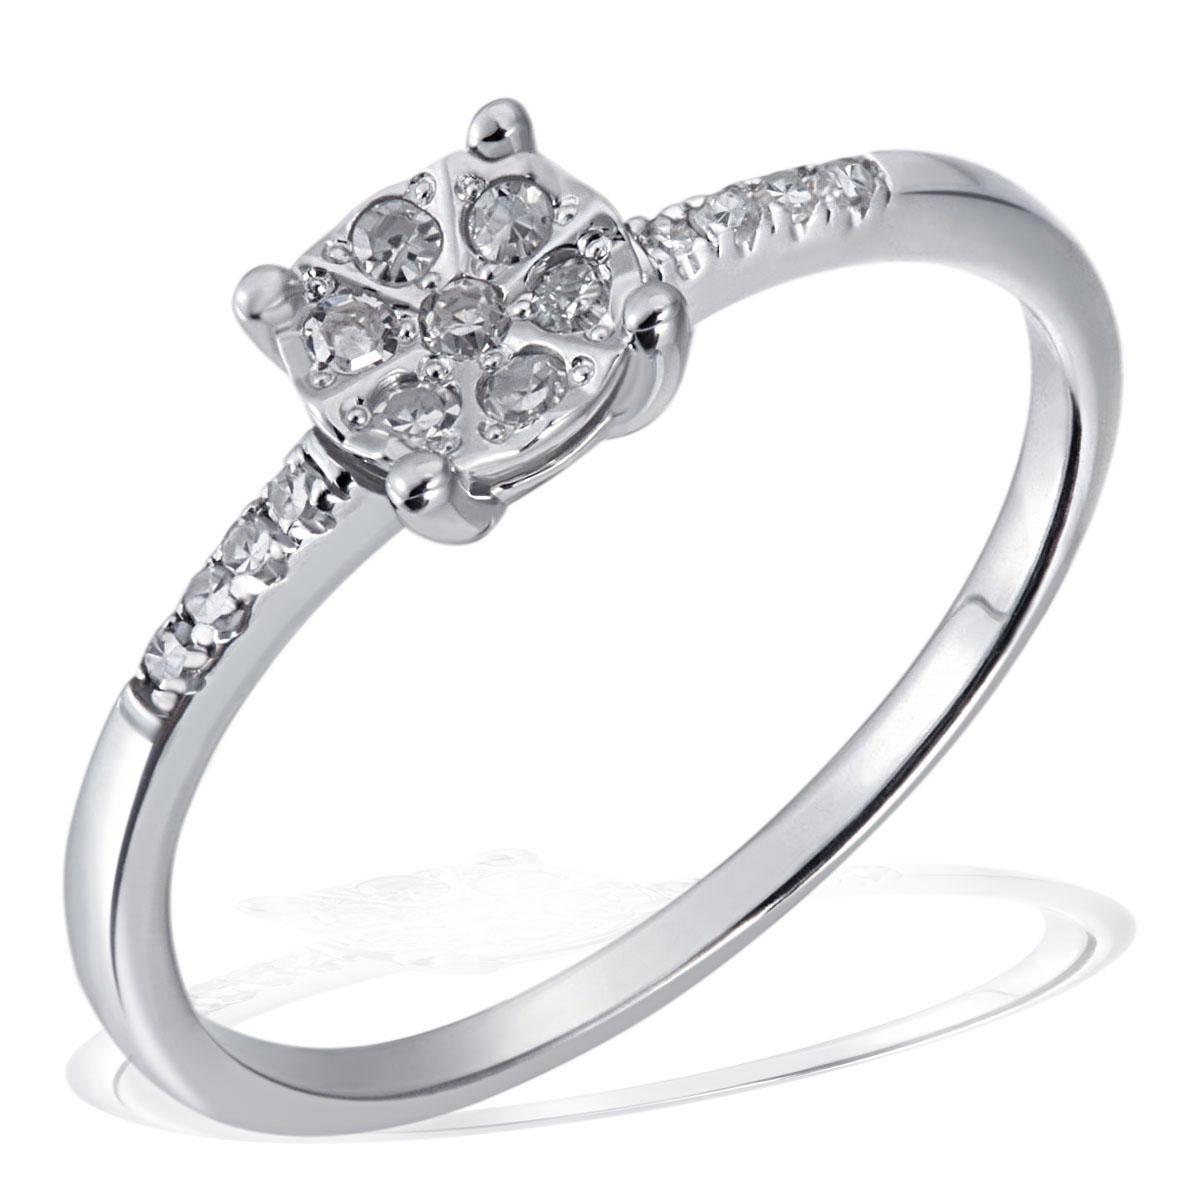 goldmaid damenset 585 wei oder gelbgold ring collier oder ohrringe diamant neu ebay. Black Bedroom Furniture Sets. Home Design Ideas